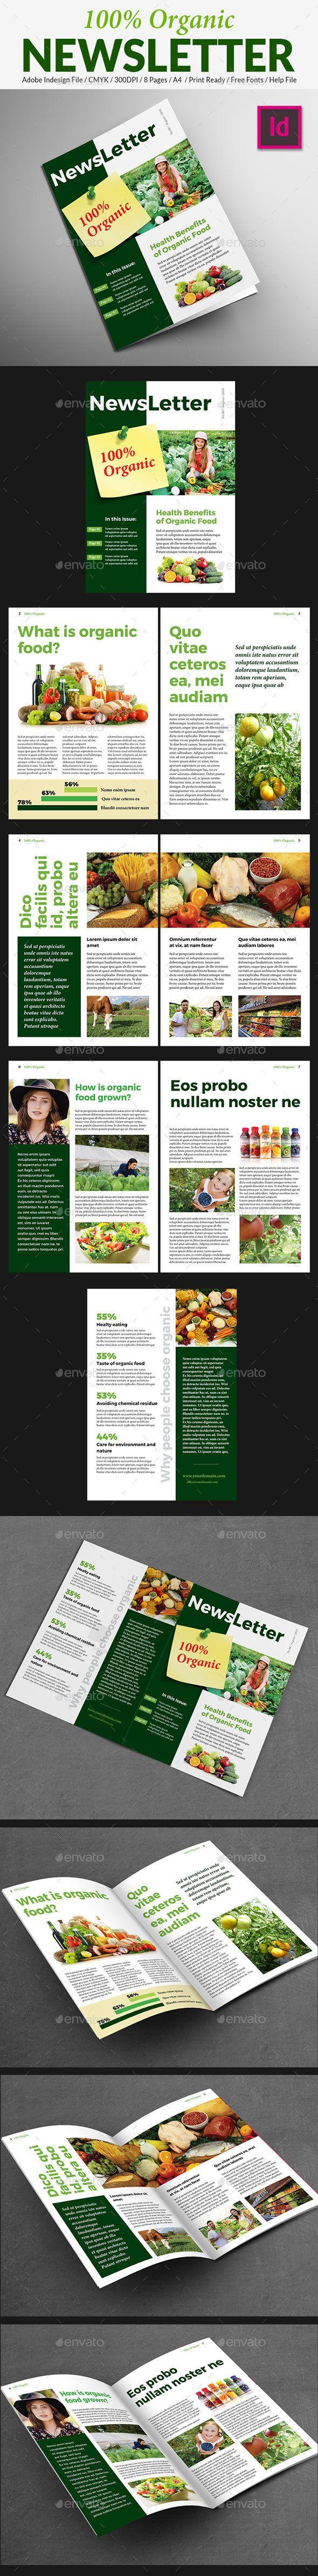 Organic Food Newsletter Layout TemplatePrint 632